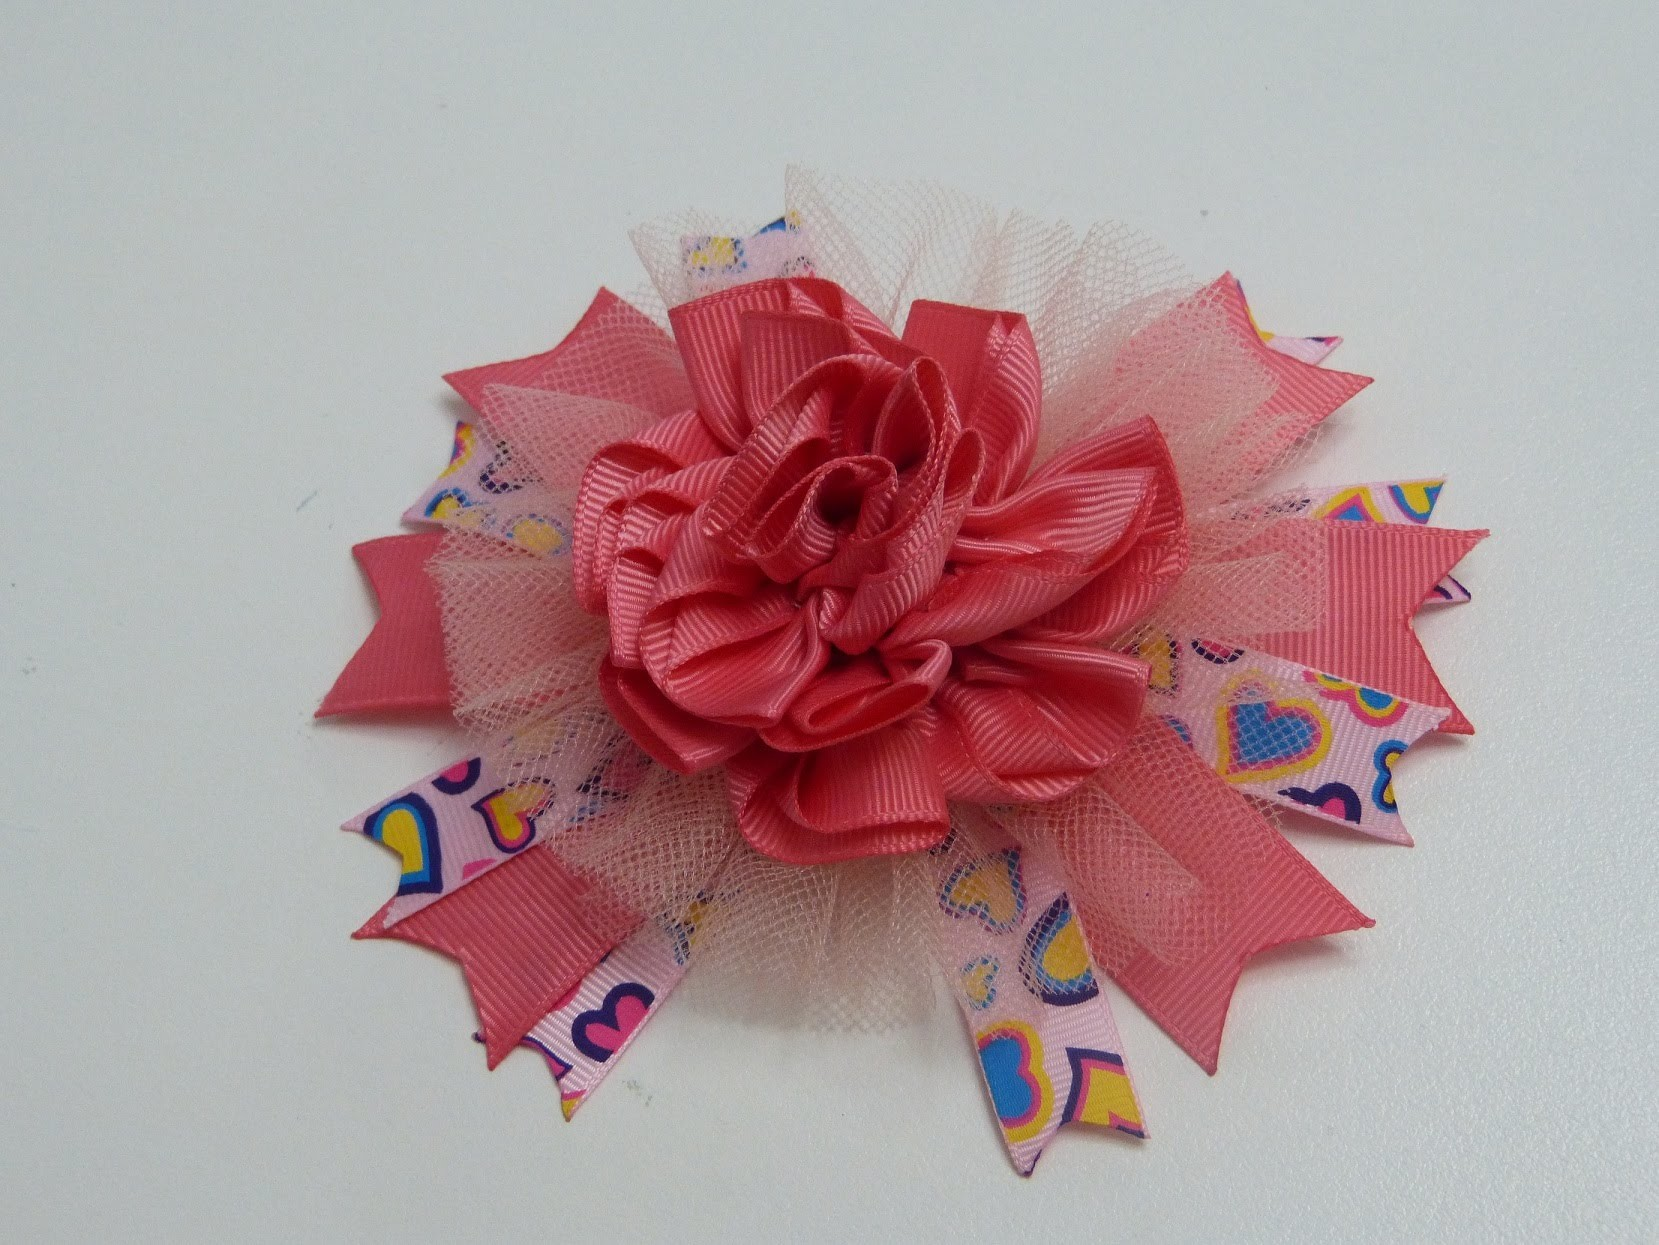 PAP FLORES, ROSAS,  FLOWERS TUTORIAL,  Flores en cintas,How to fabric flowers